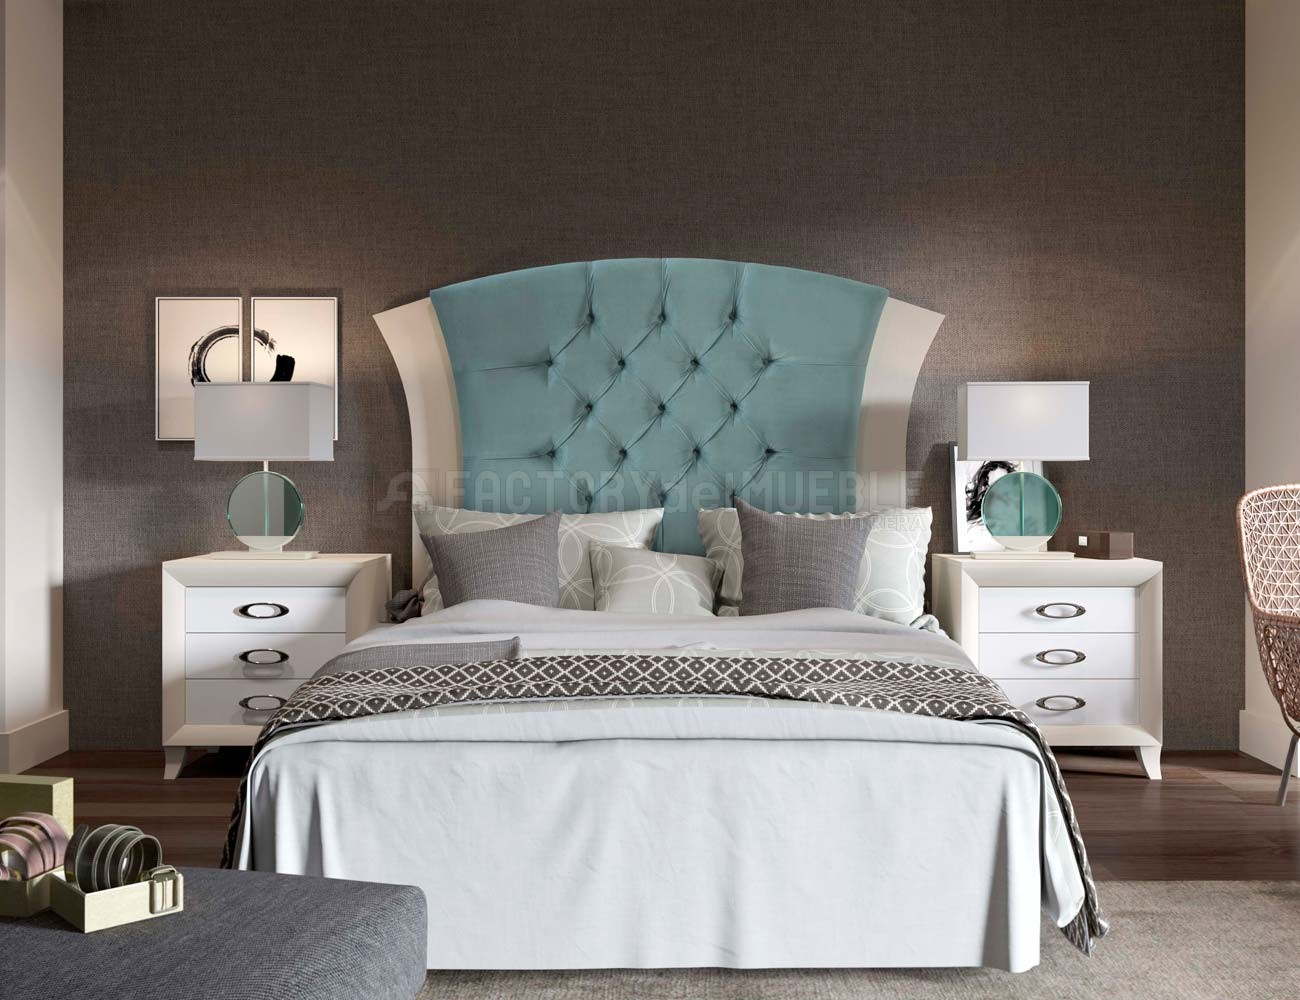 Dormitorio marilyn turquesa1